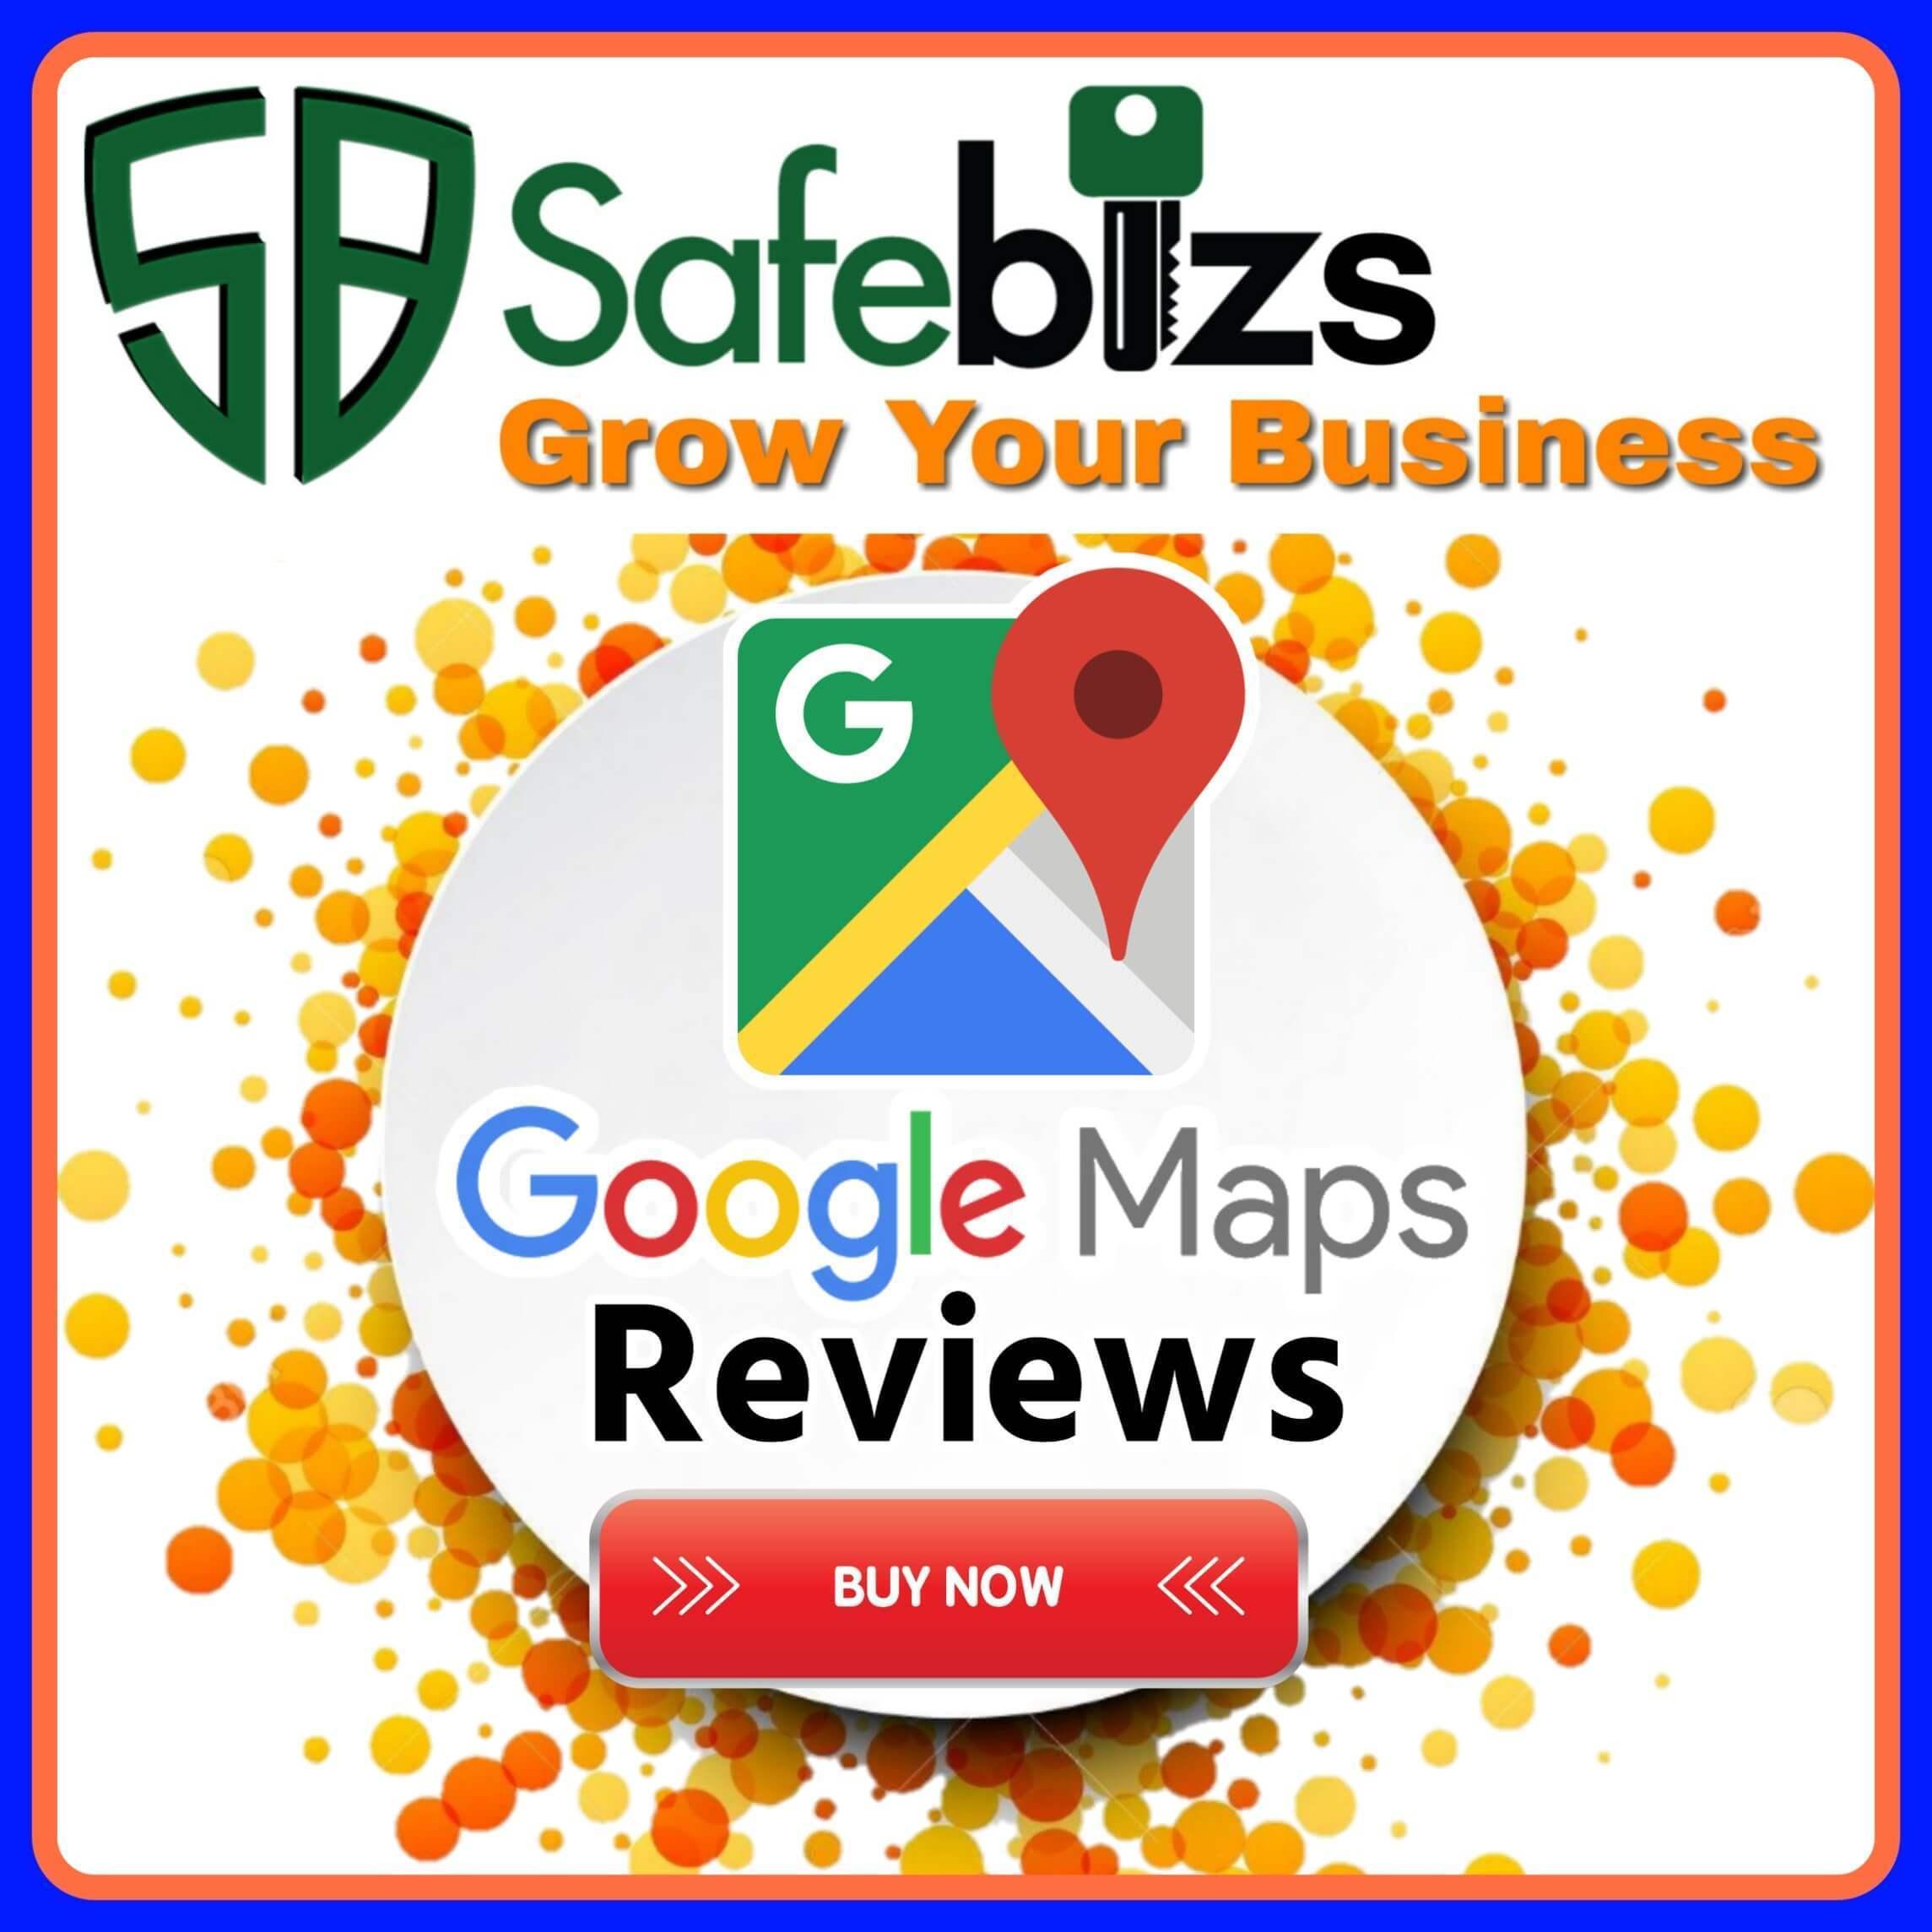 Buy Google Maps Reviews - 100% Best Google Reviews